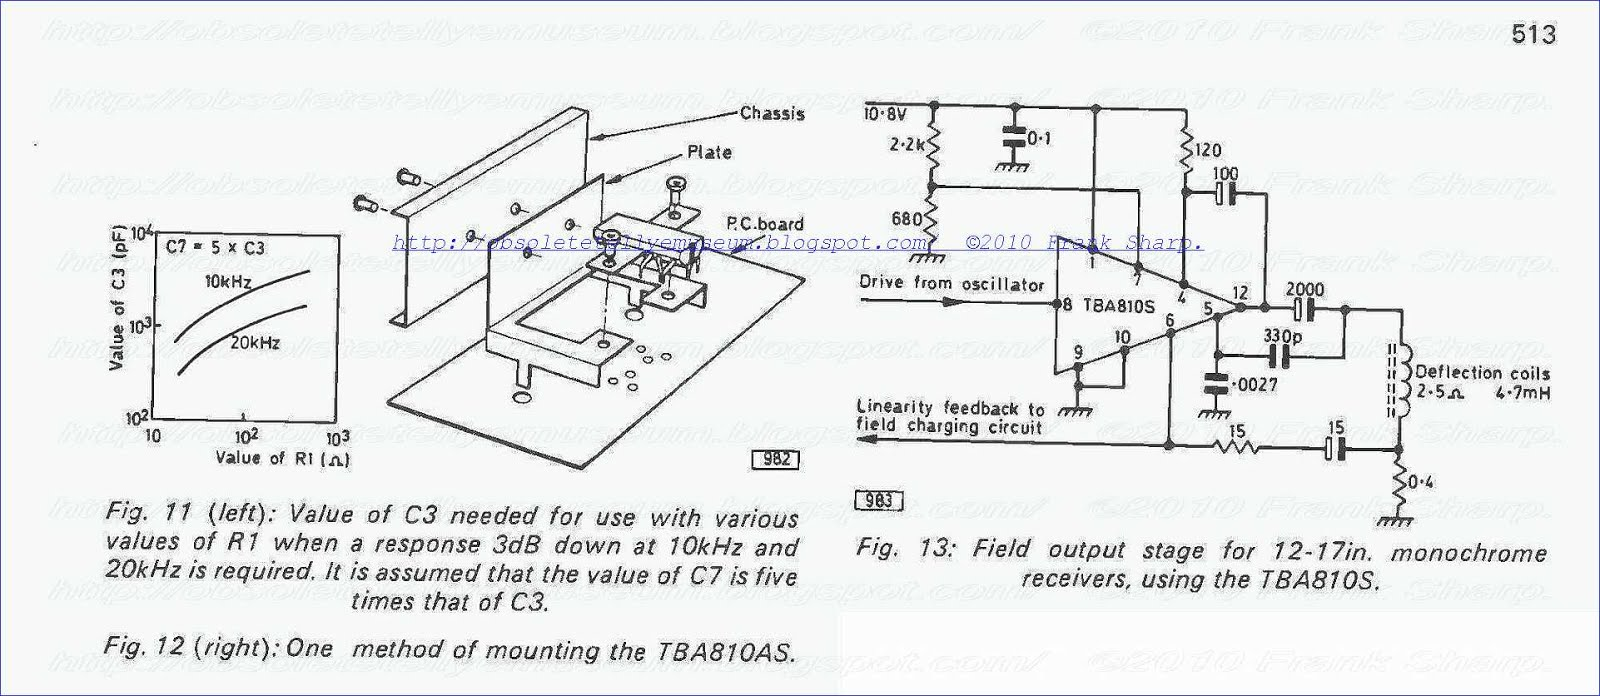 obsolete technology tellye itt schaub lorenz ideal color 1844 at wiring diagram for jacobs ultra [ 1600 x 696 Pixel ]